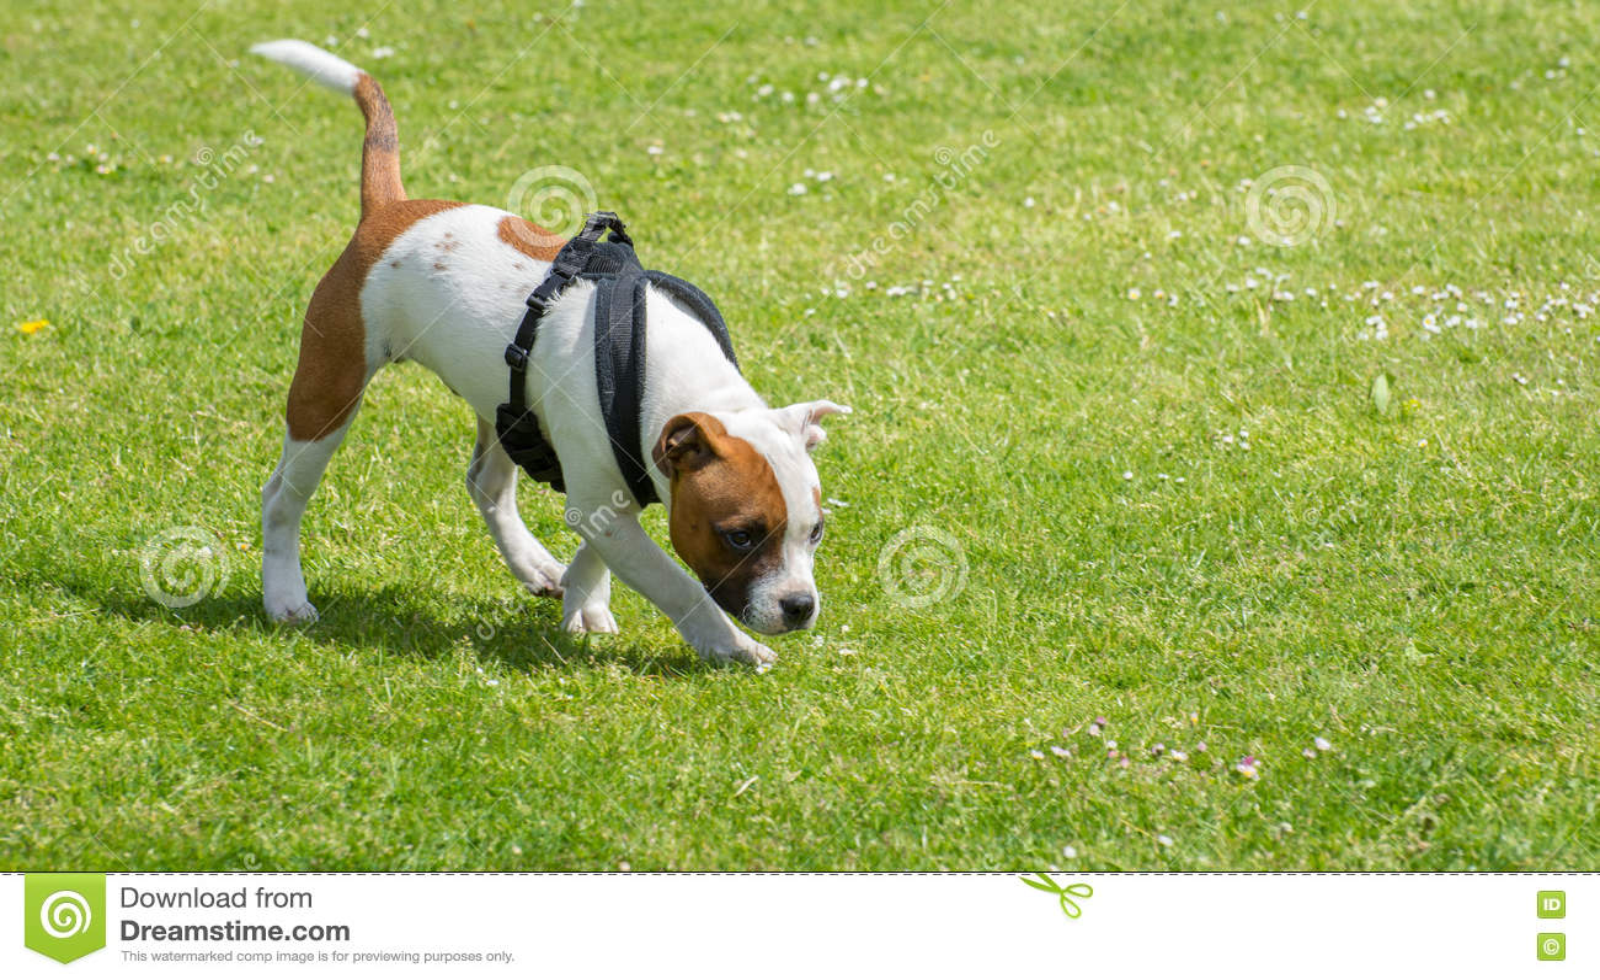 English staffordshire bull terrier puppy.